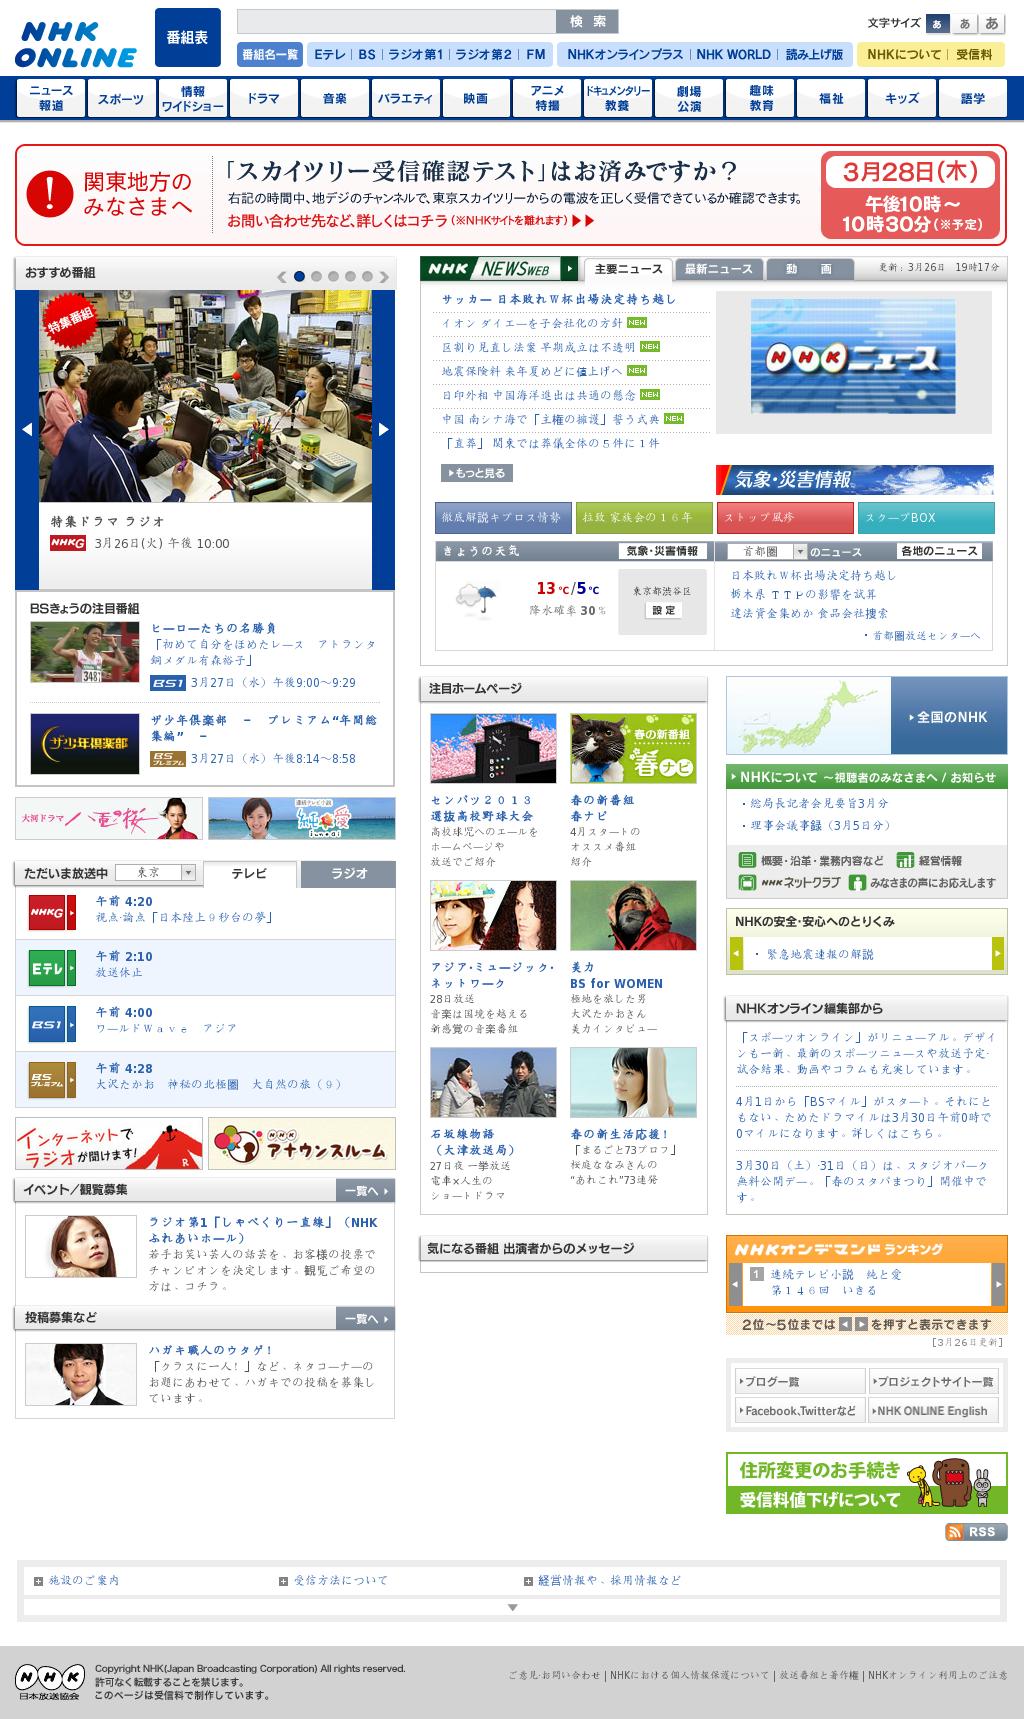 NHK Online at Tuesday March 26, 2013, 7:30 p.m. UTC